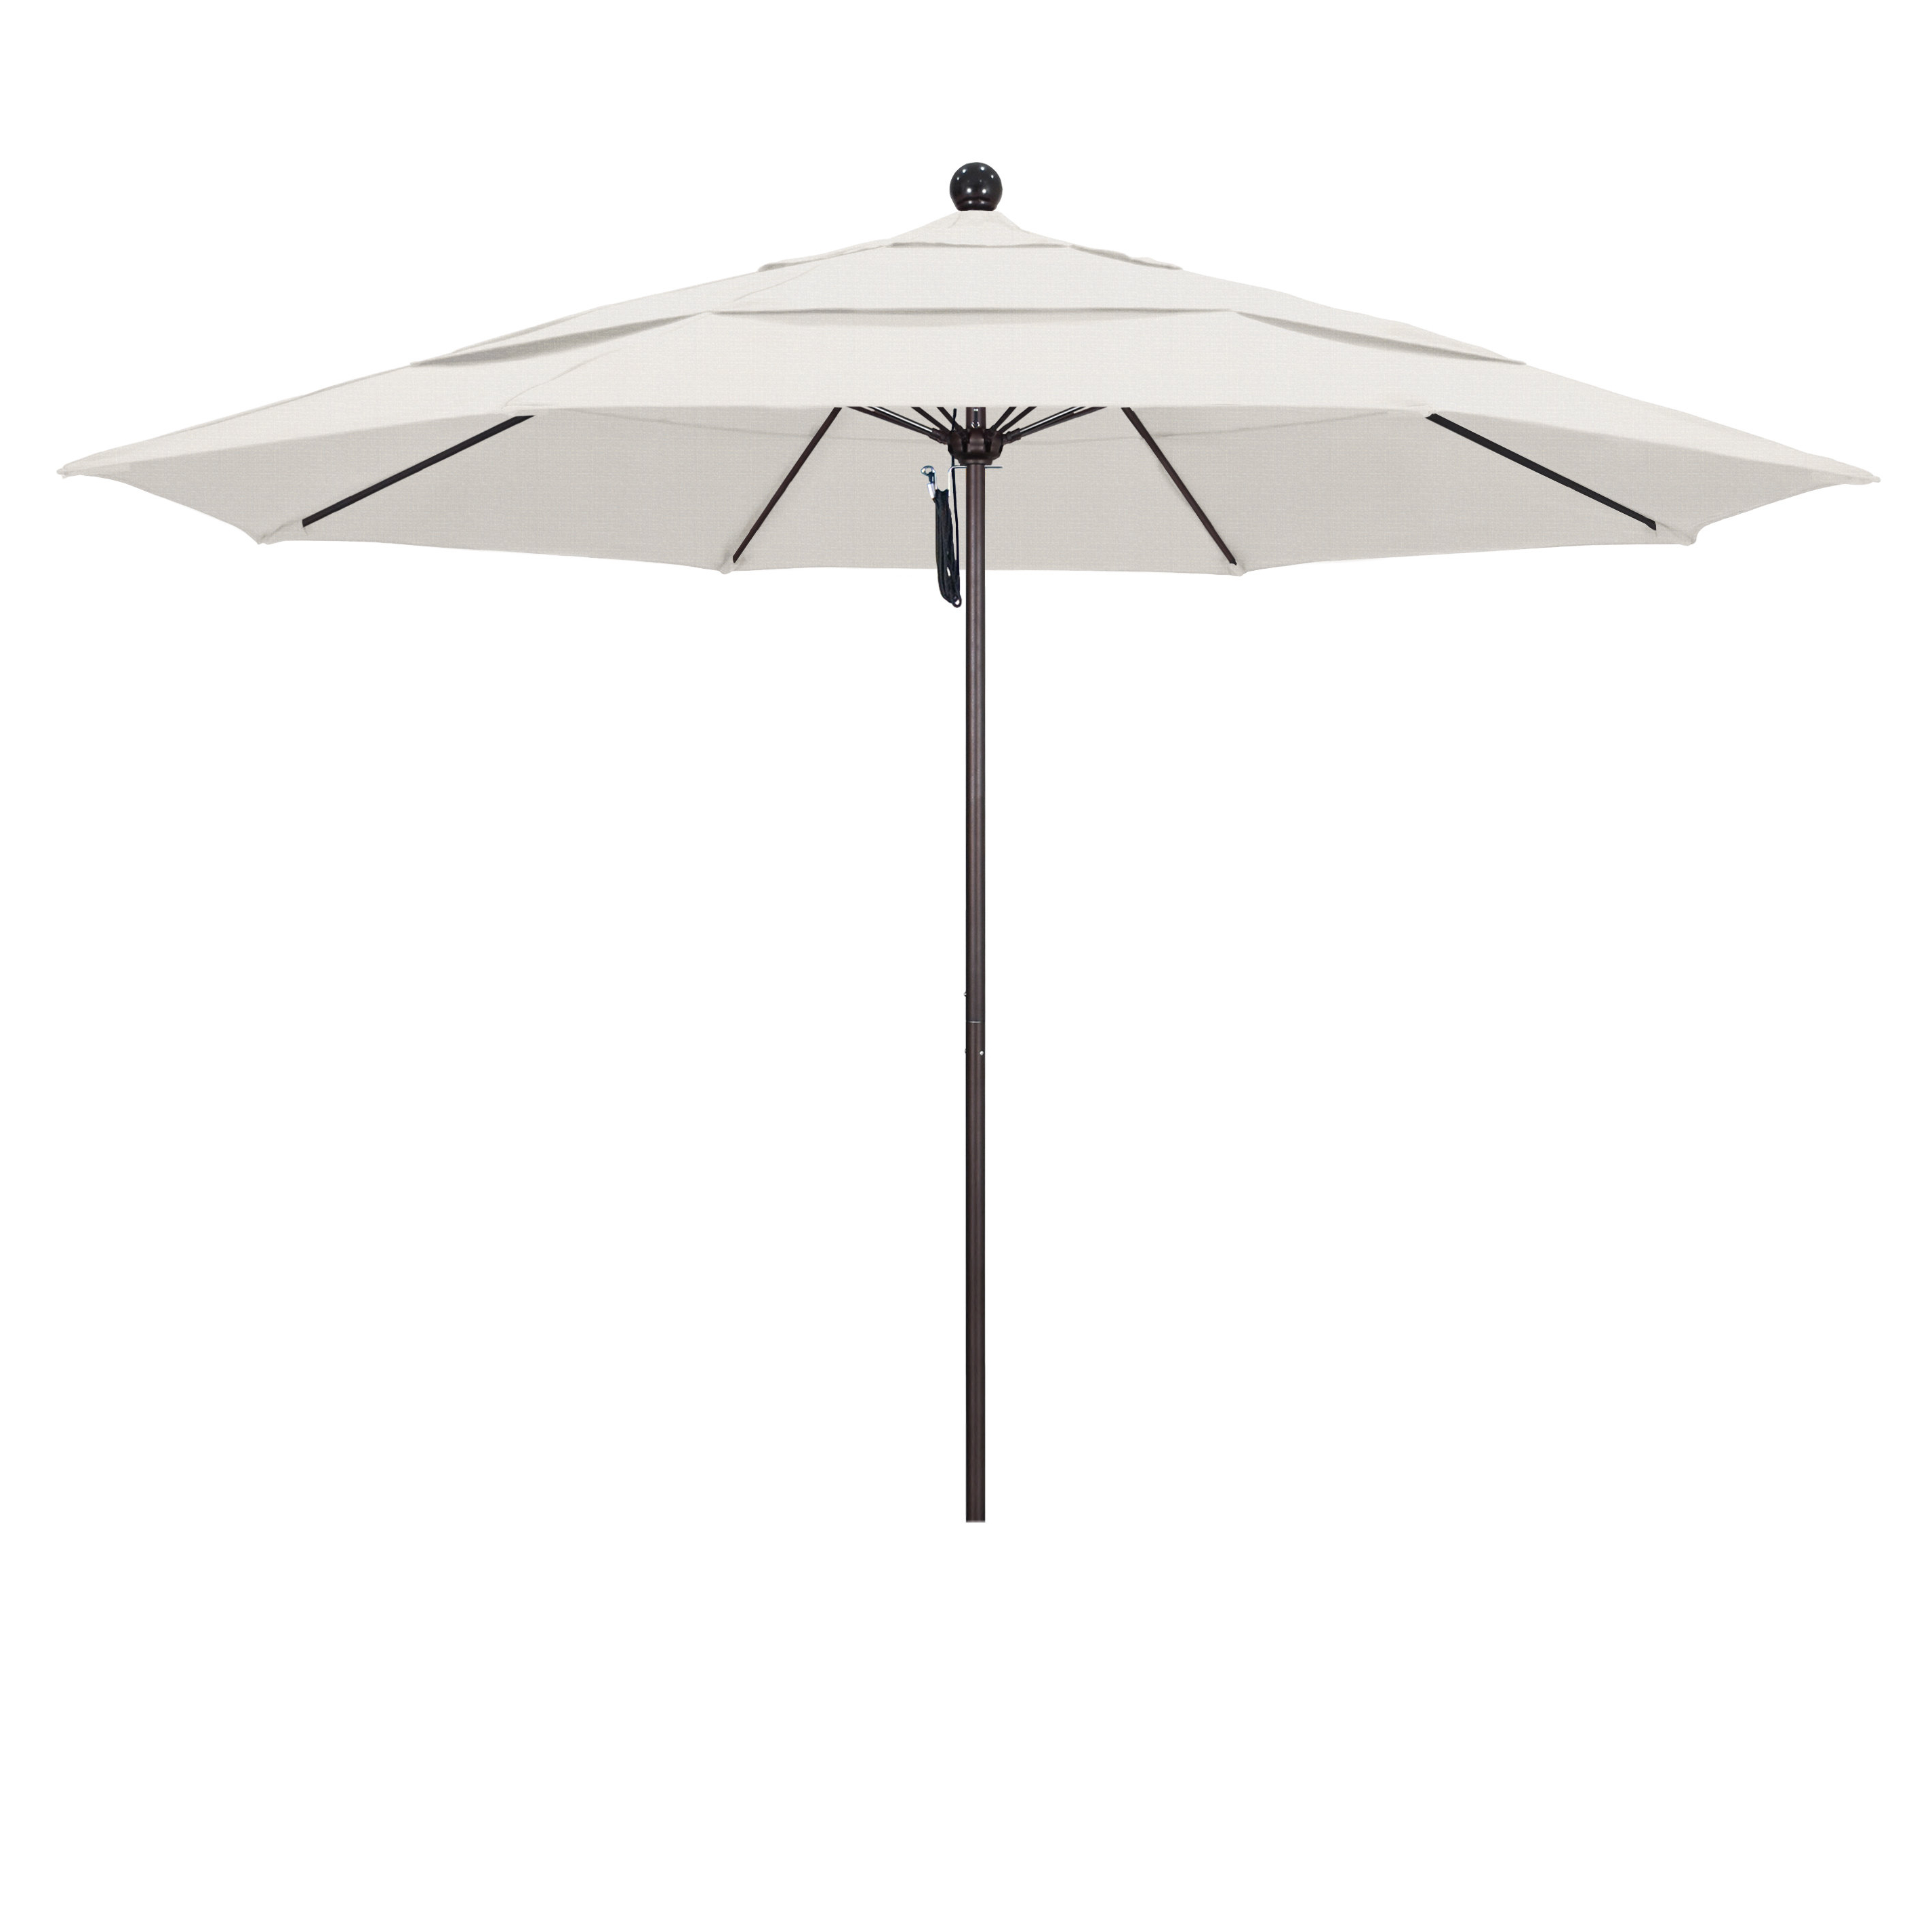 Caravelle Market Sunbrella Umbrellas With Regard To Recent Davenport 11' Market Umbrella (View 11 of 20)